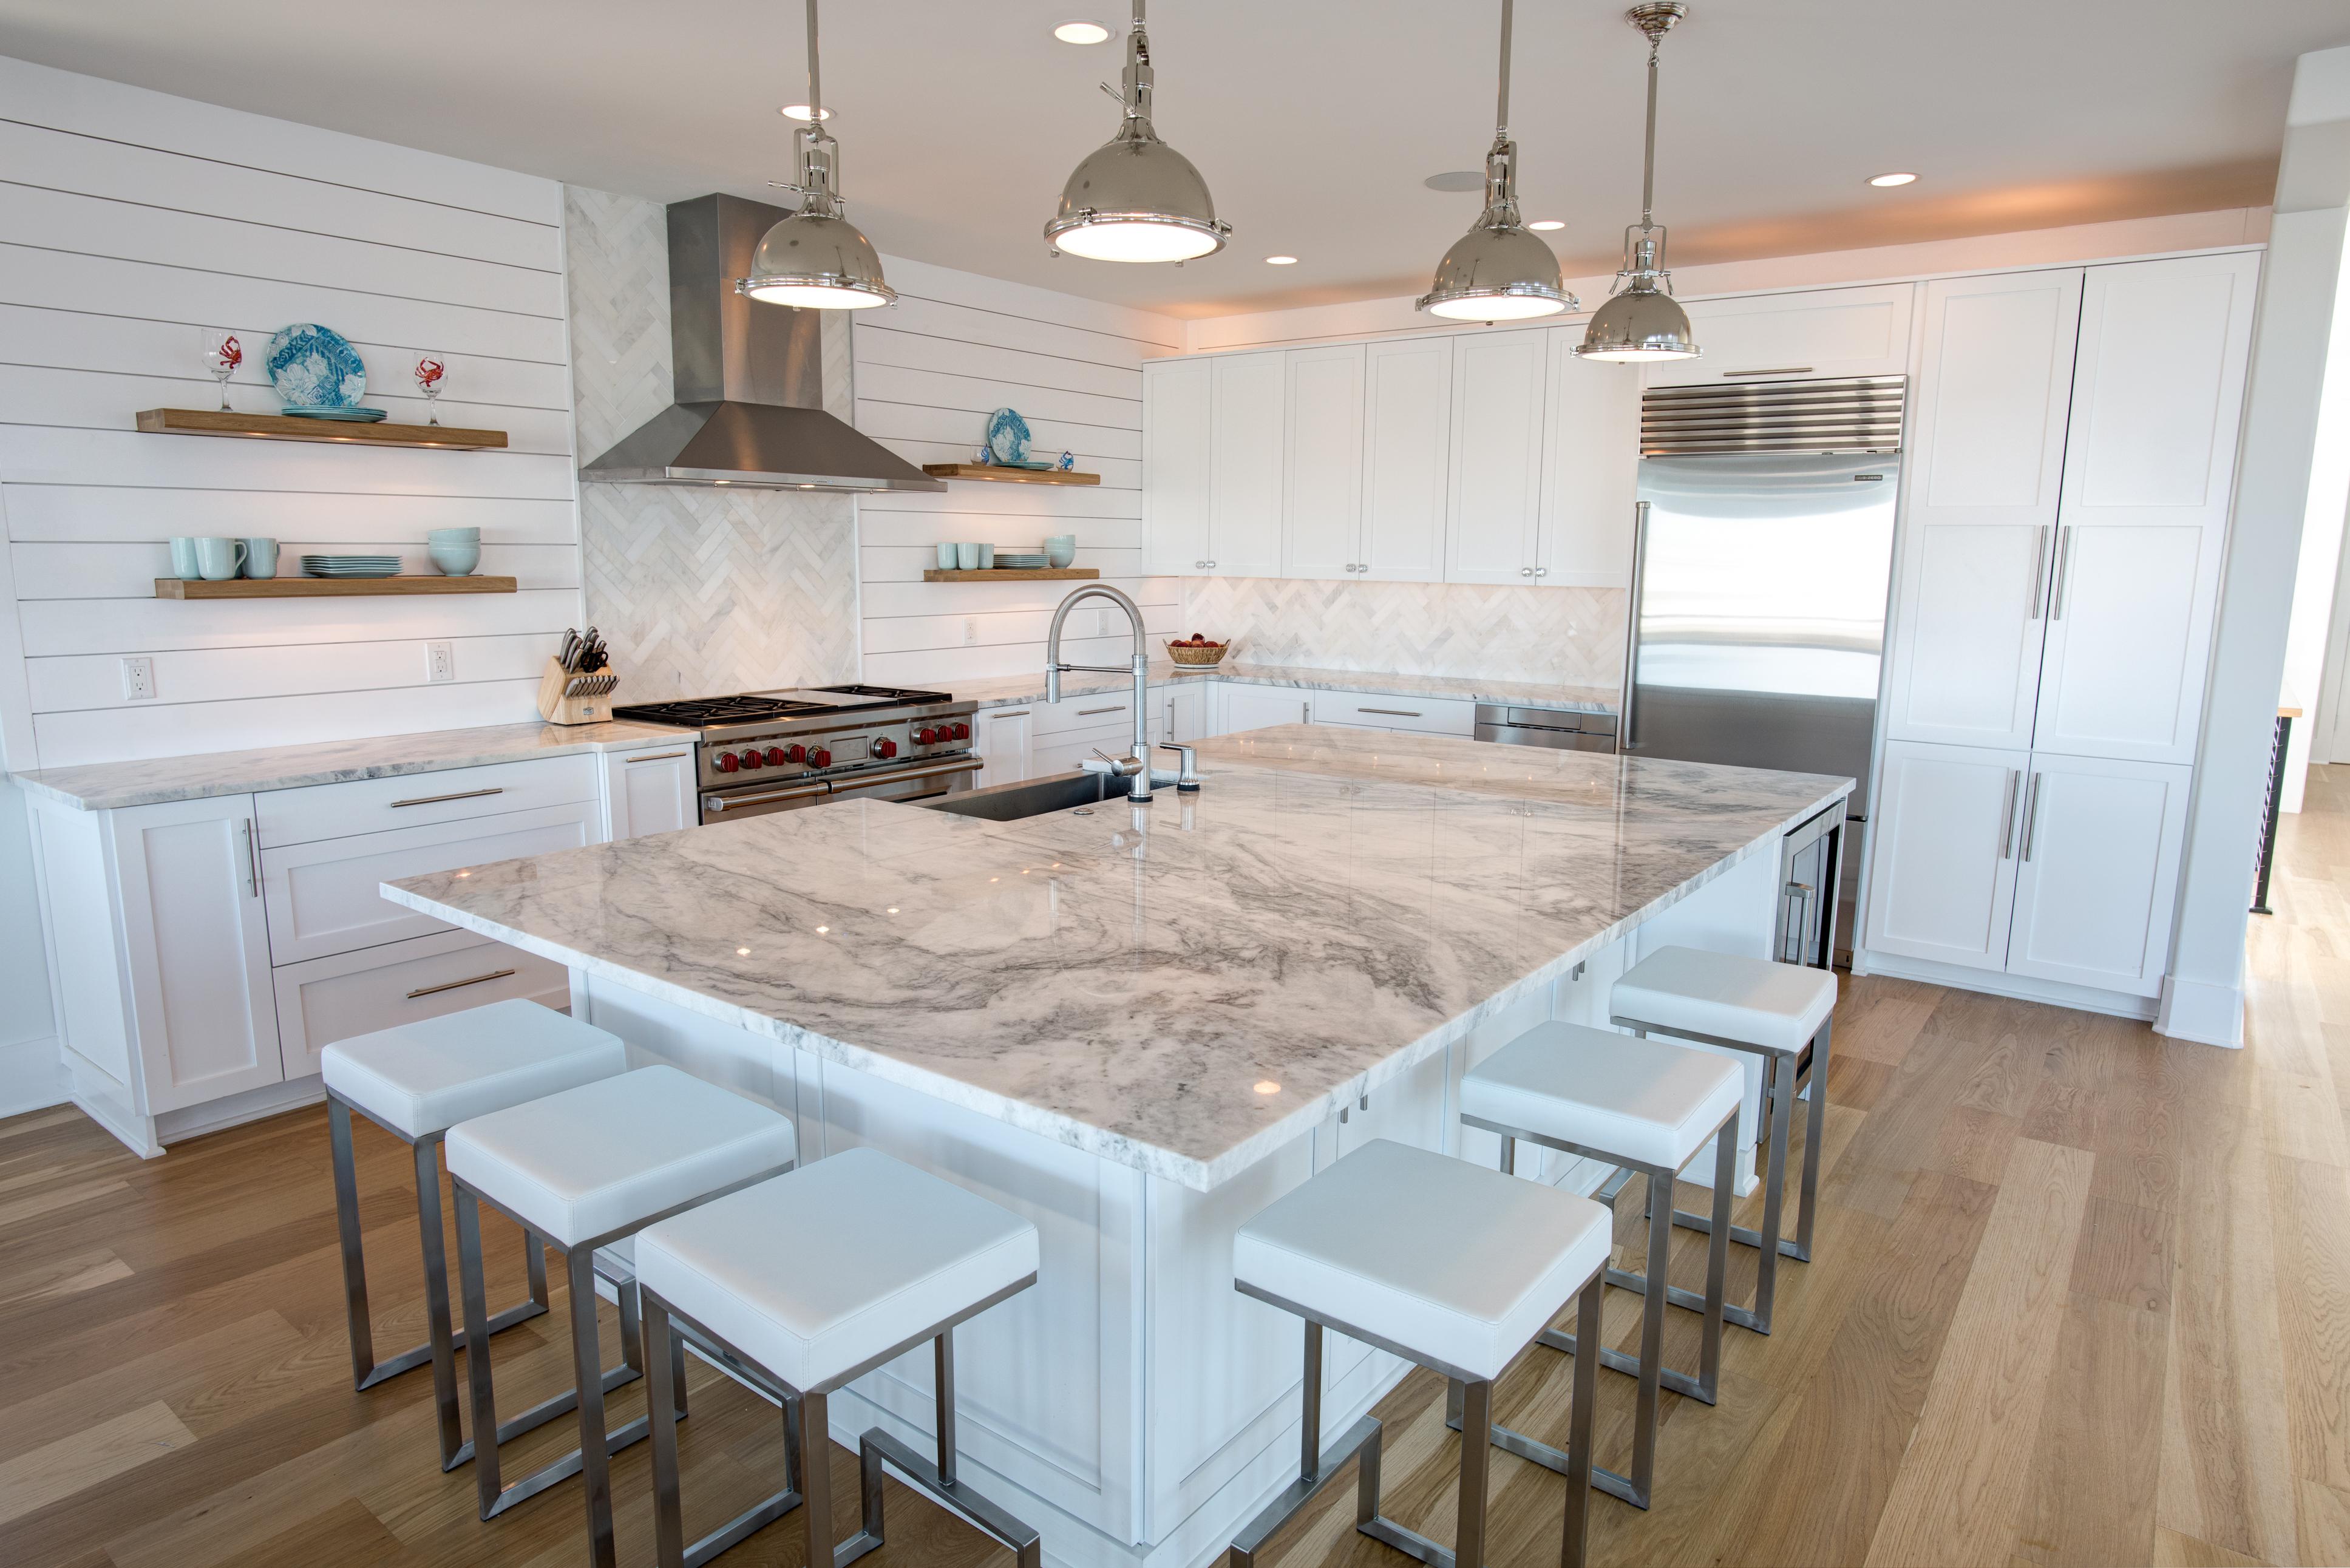 Pelligrini Kitchen